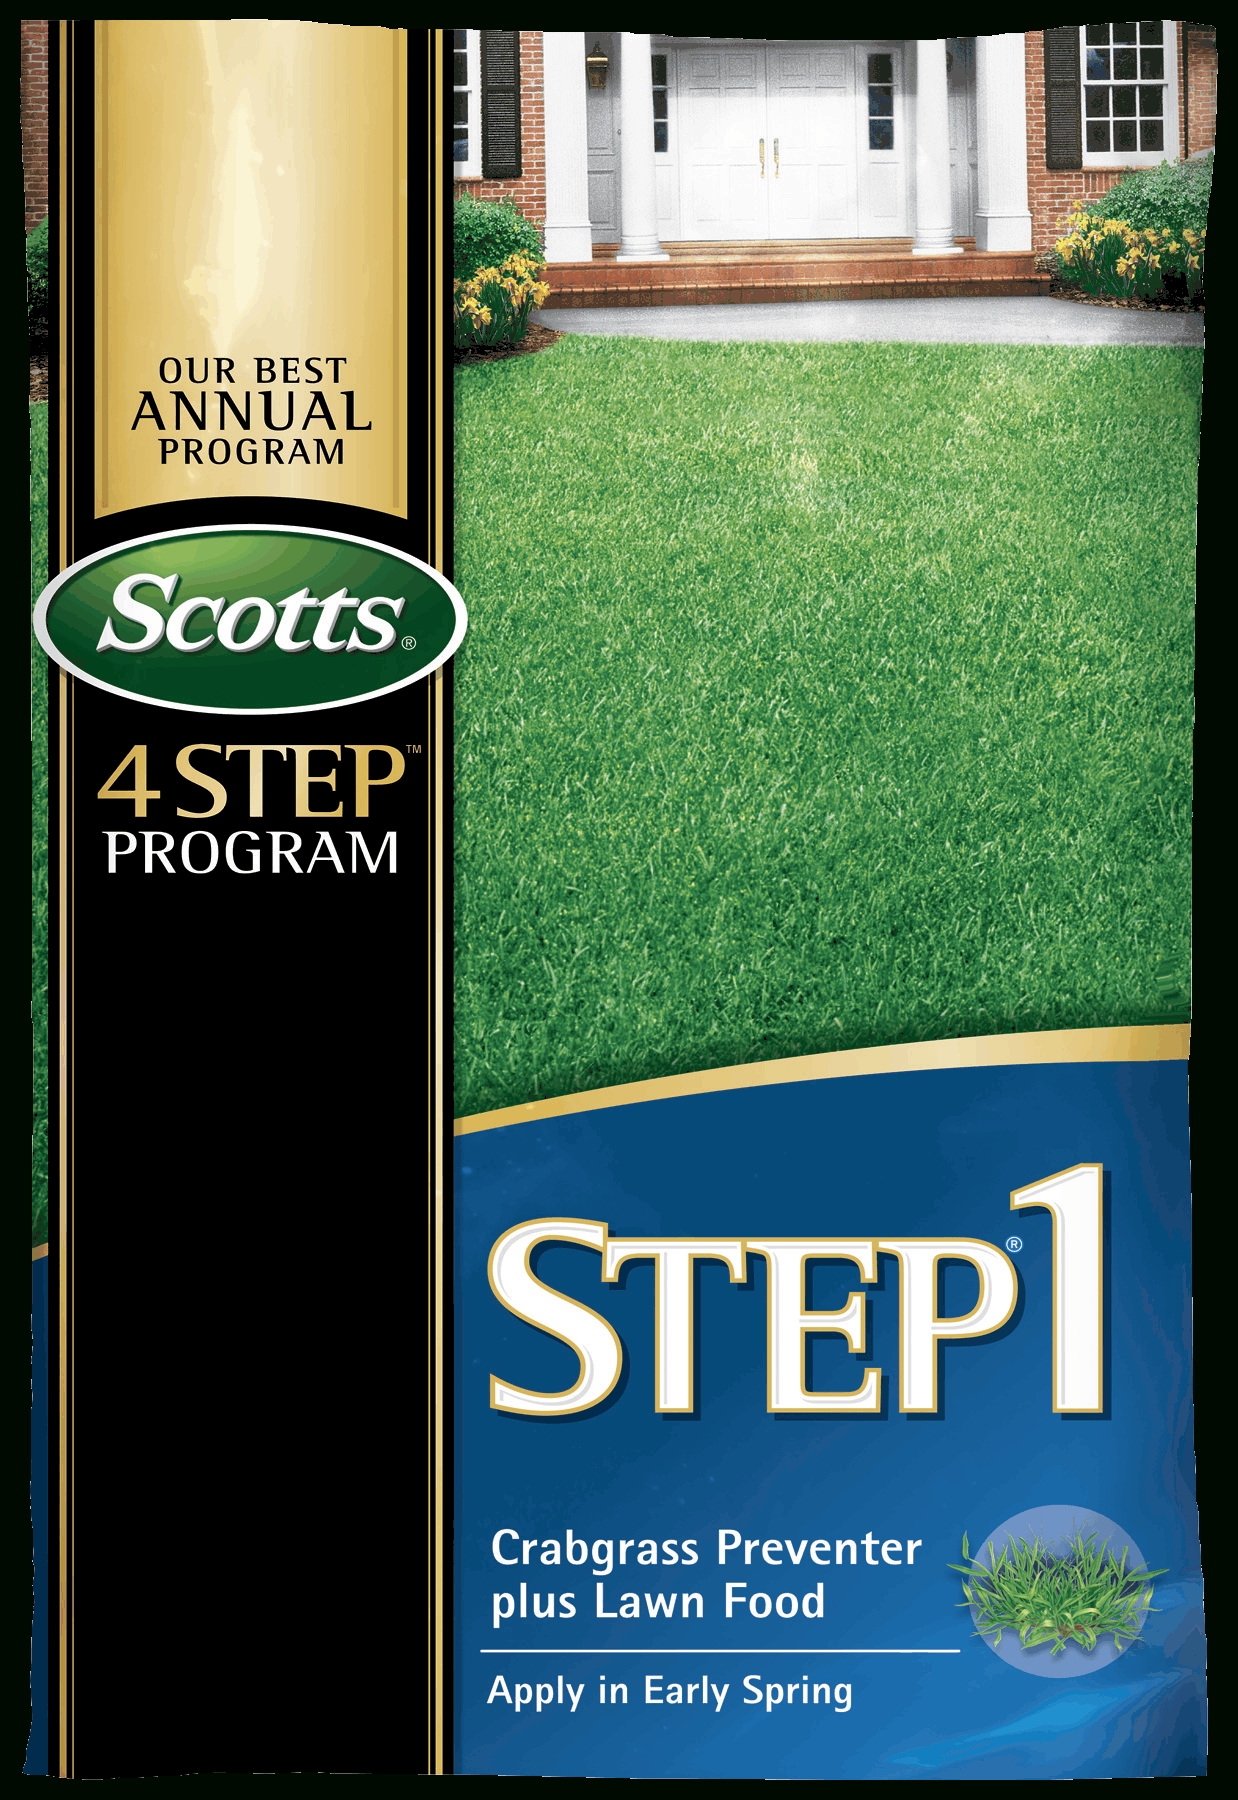 Scotts 5 Step Lawn Program Tyres2c